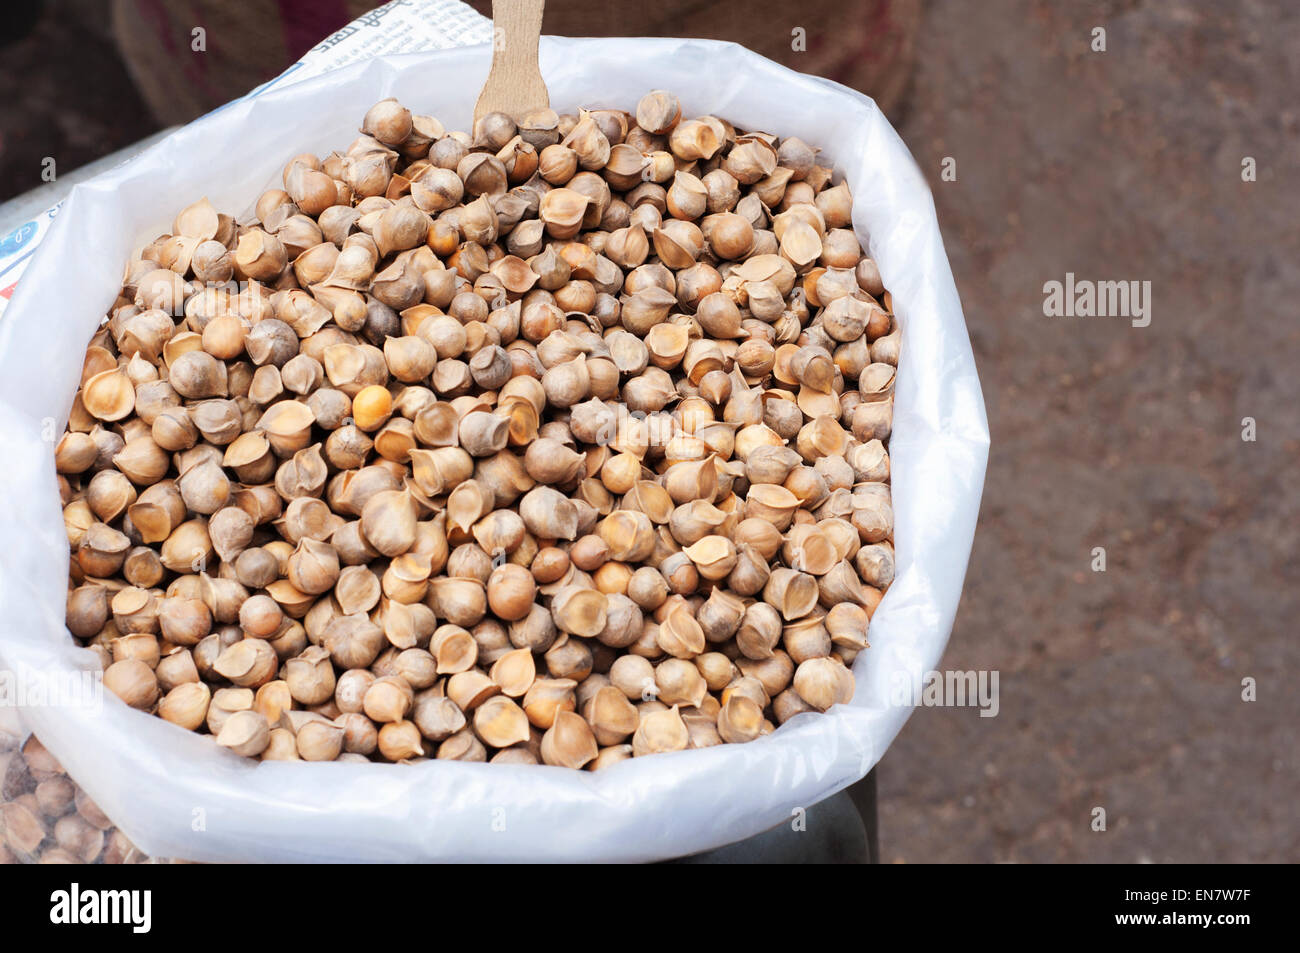 Kashmiri Garlic for sale at indian market,India - Stock Image